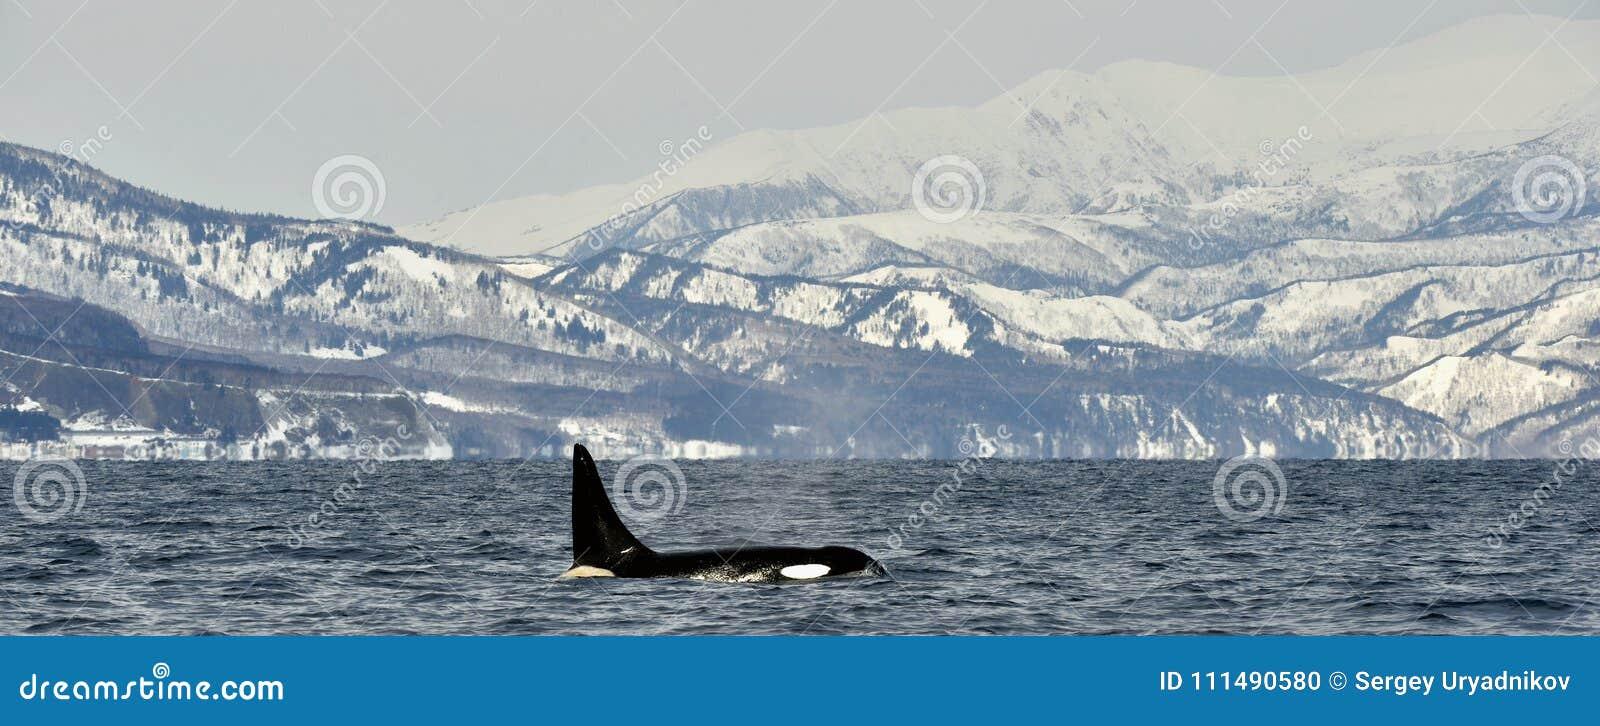 Orca or killer whale, Orcinus Orca.